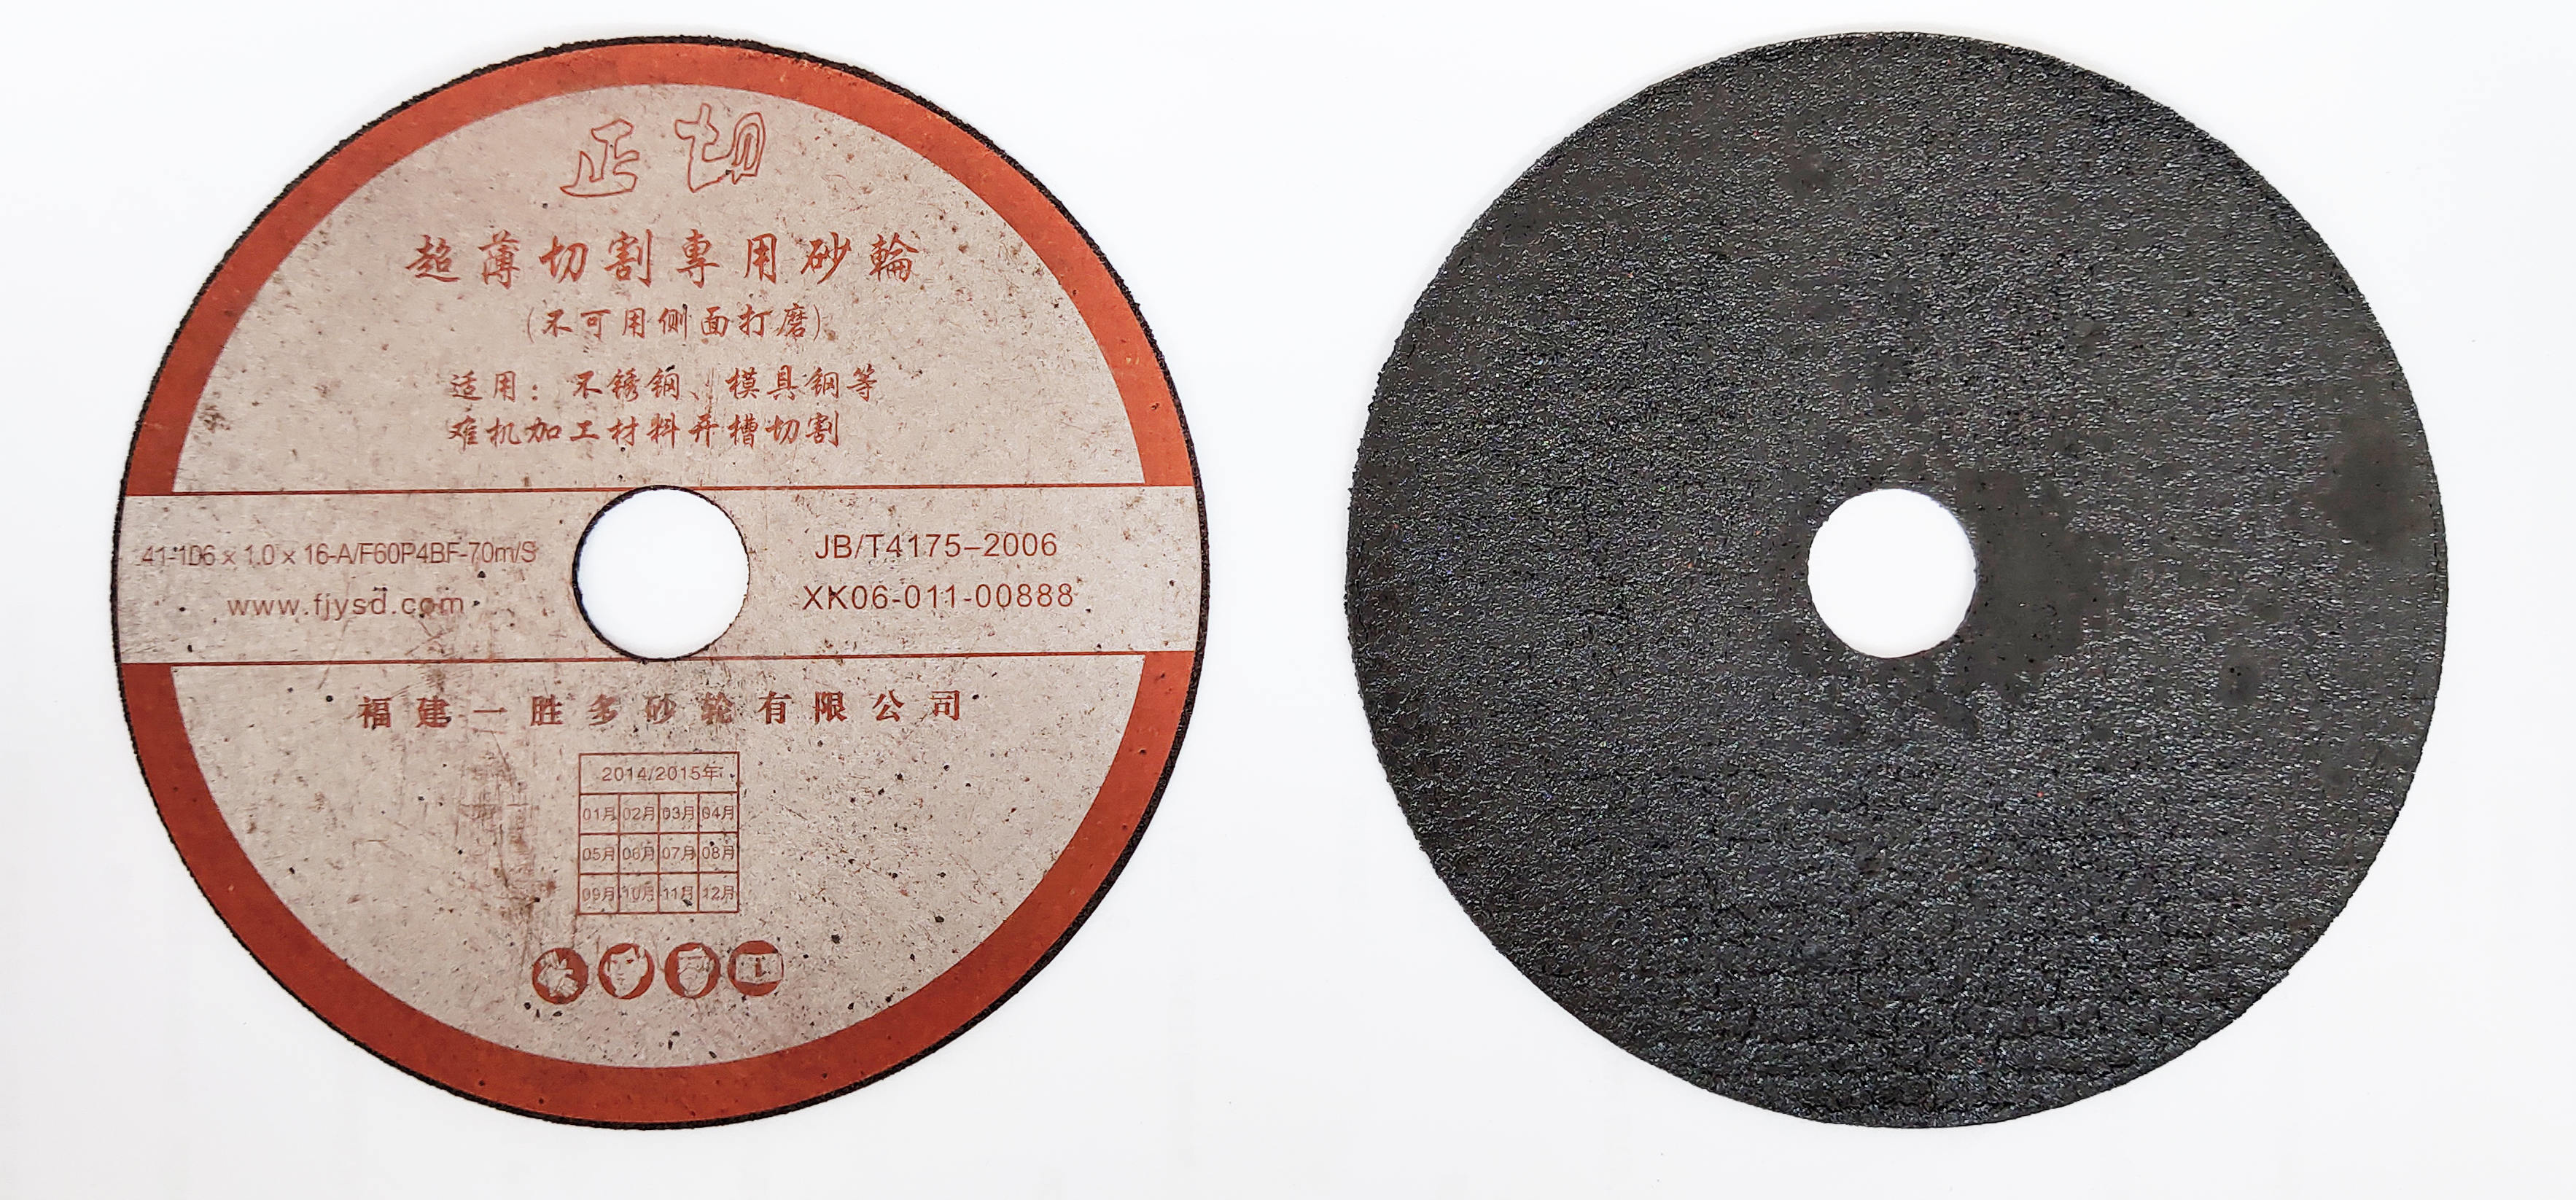 title='正切'